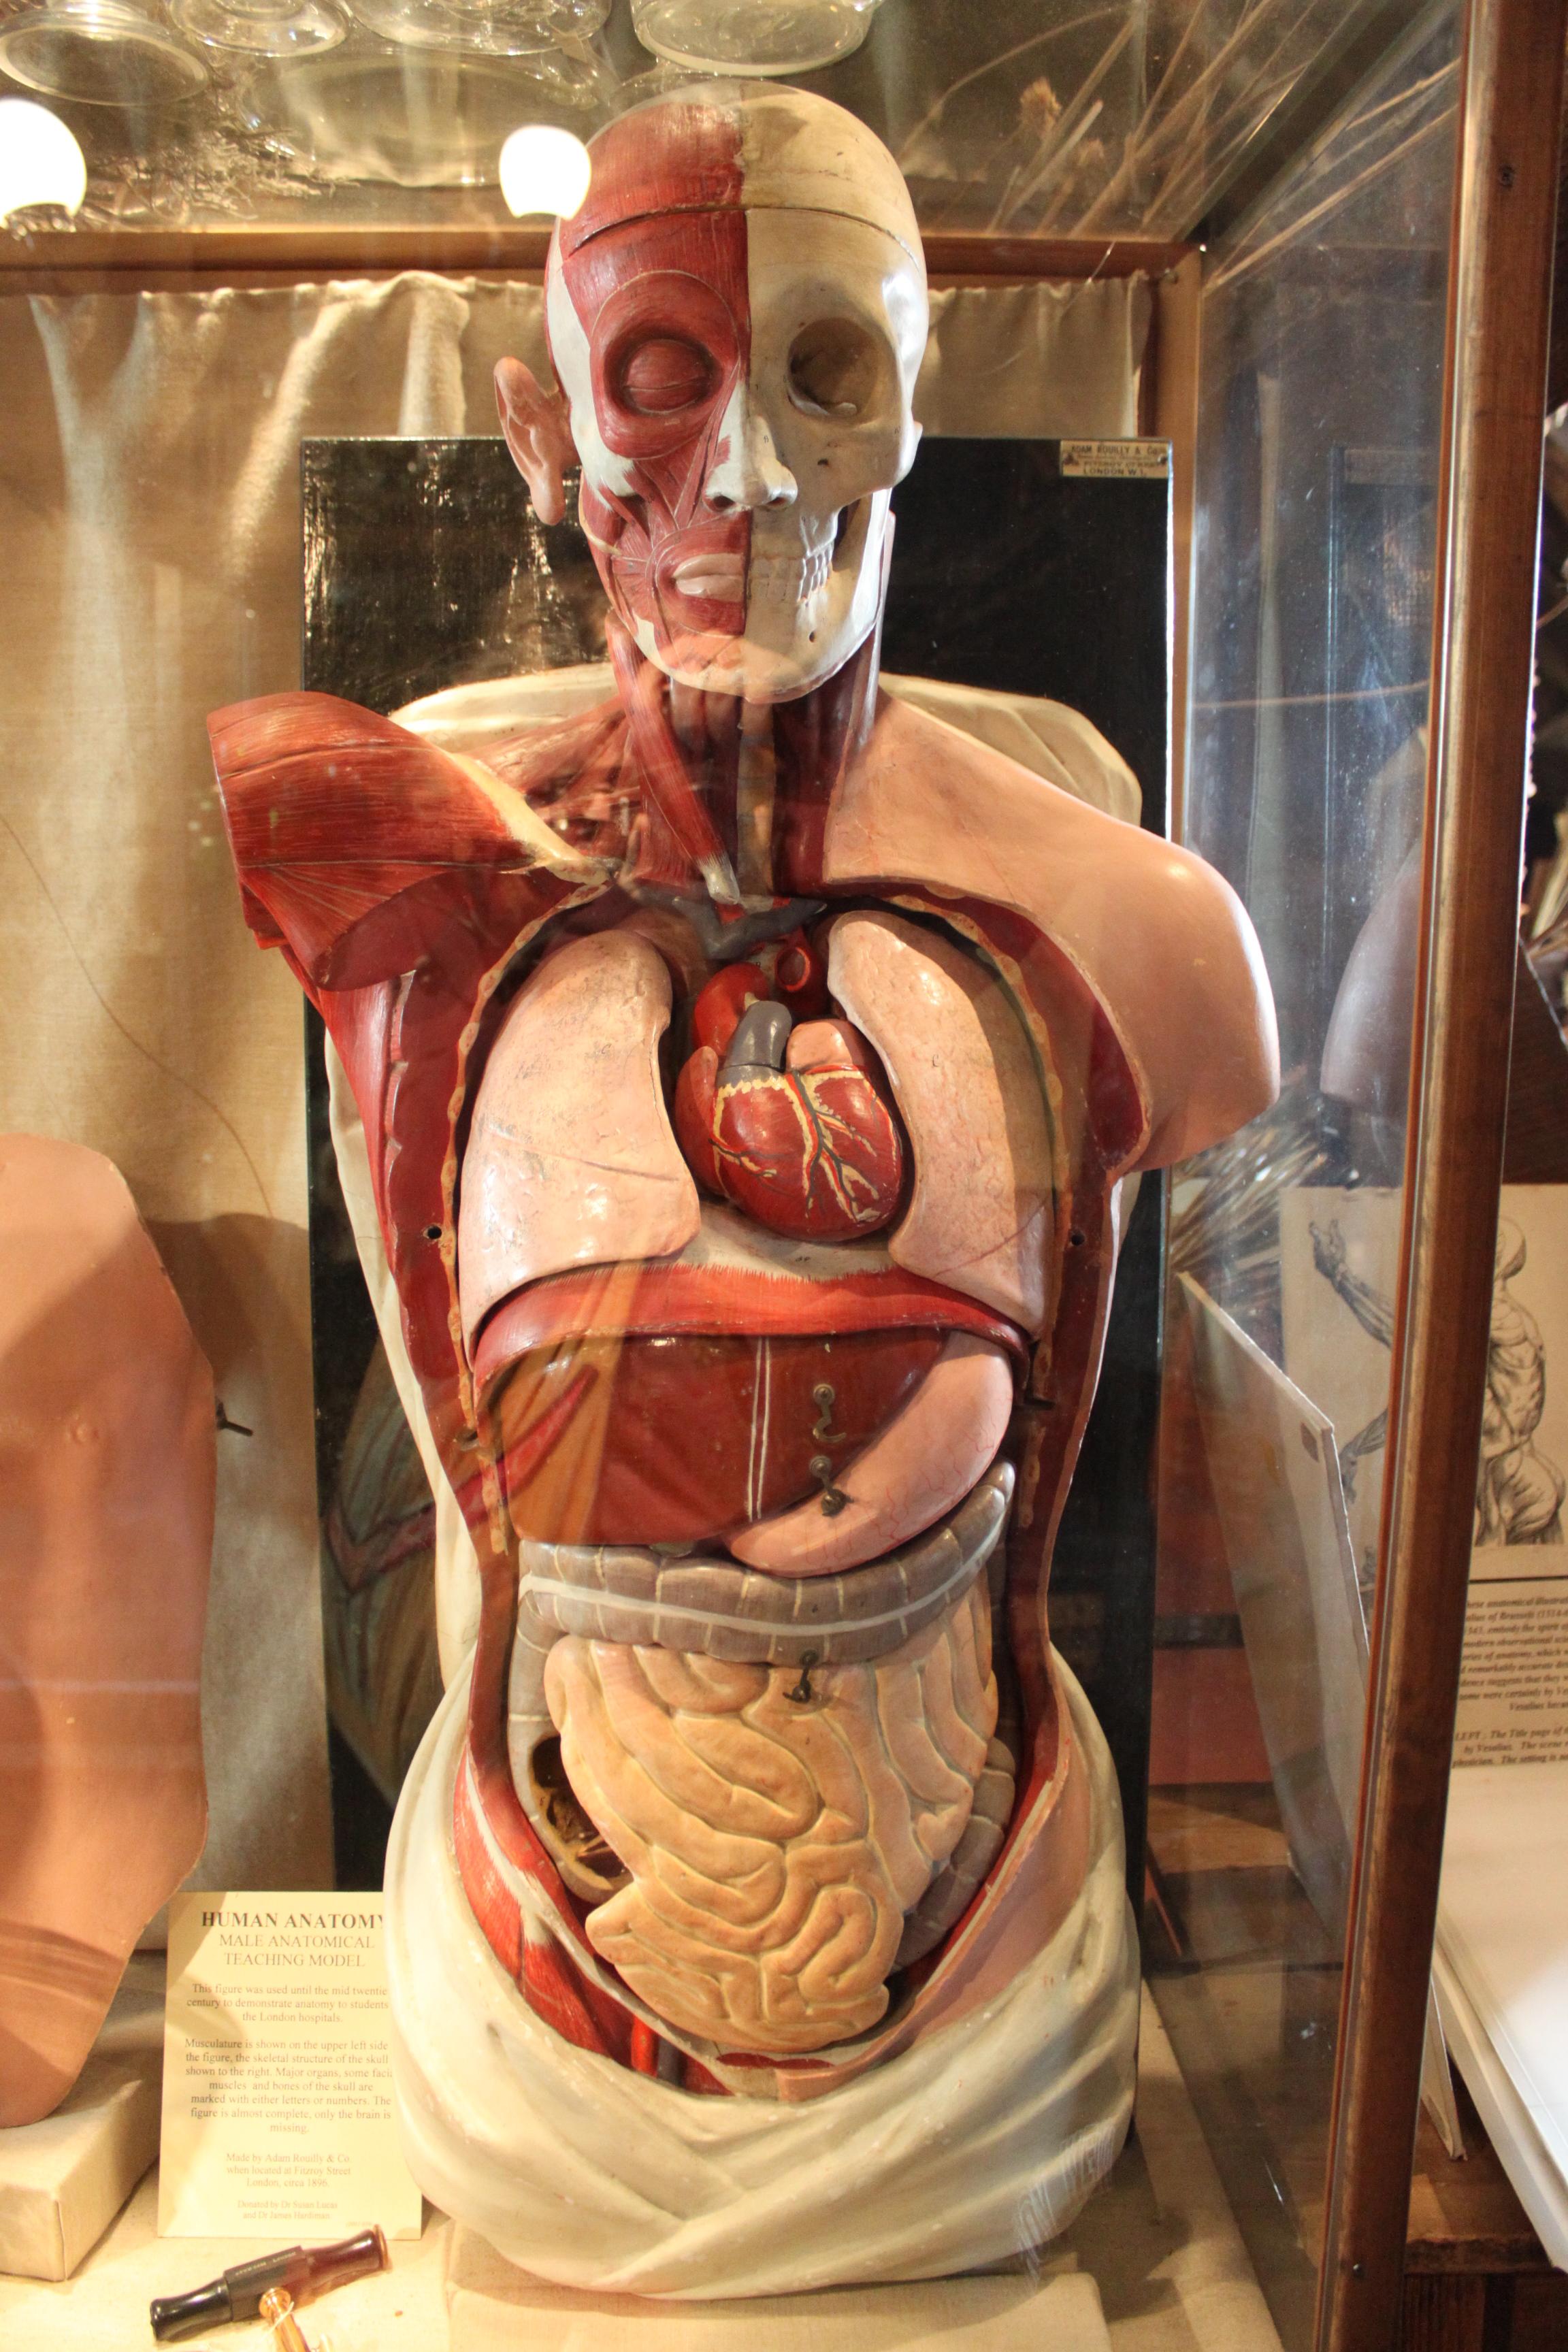 File:BLW Human Anatomy.jpg - Wikimedia Commons